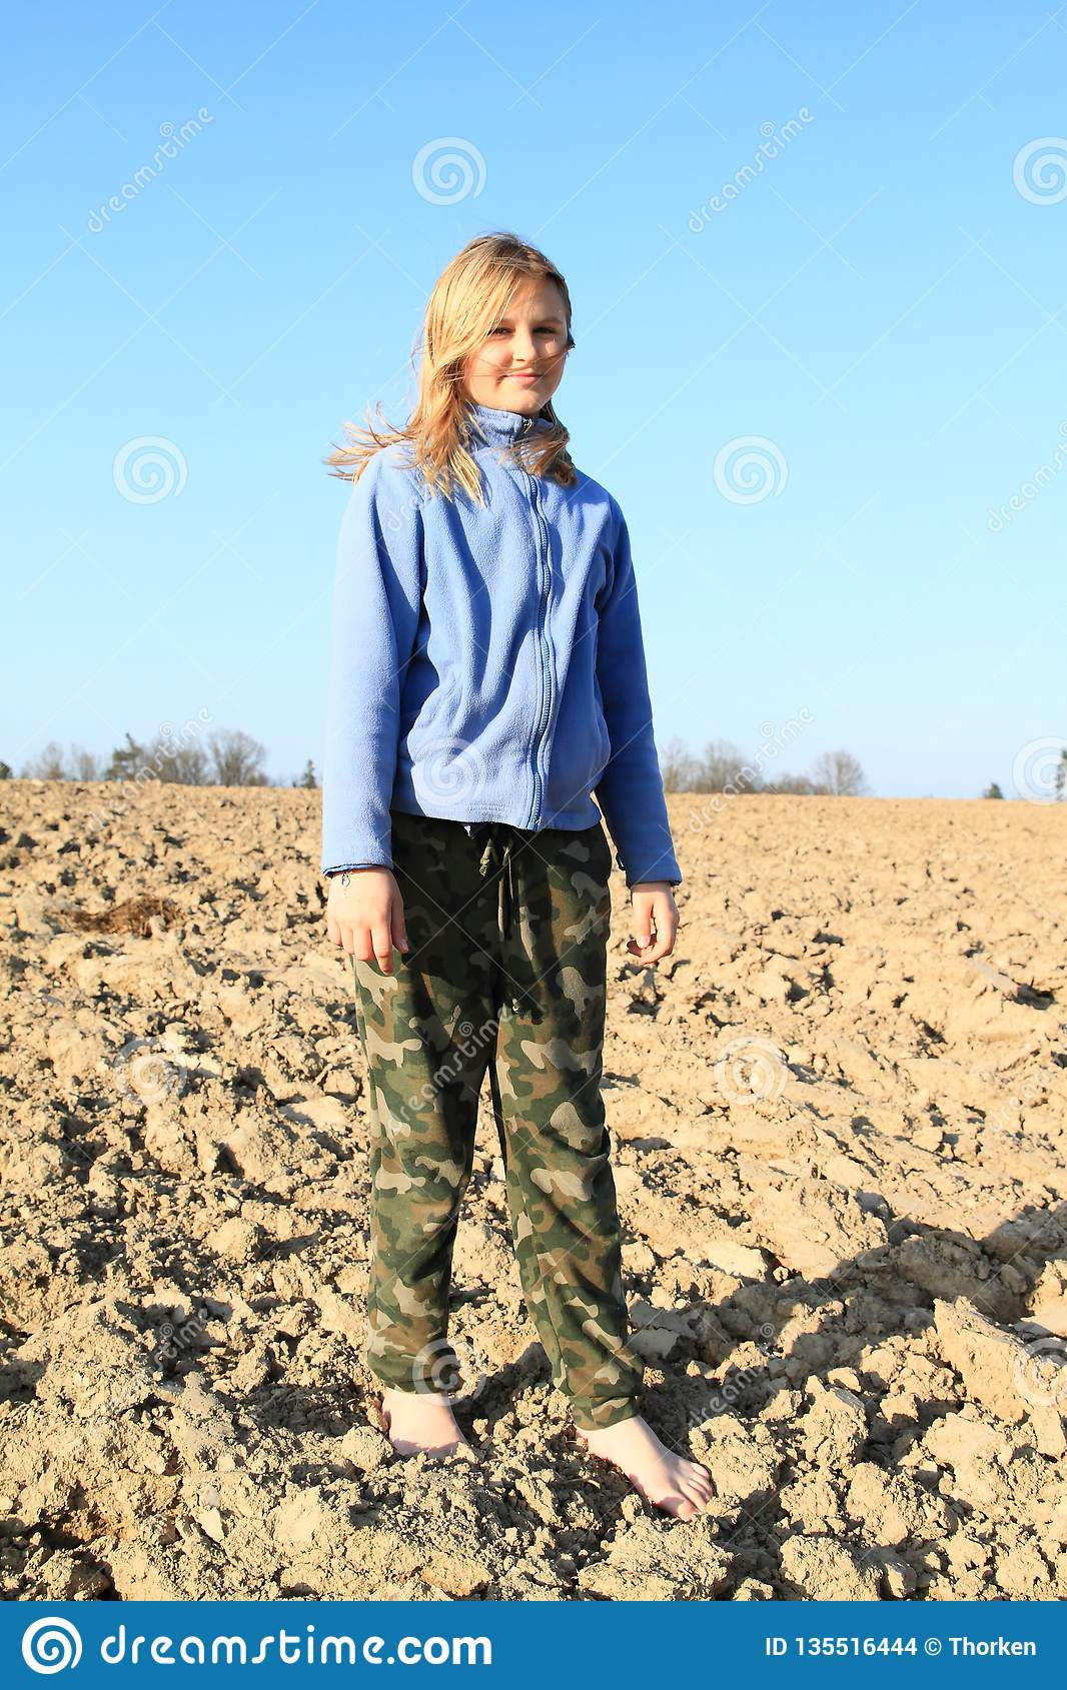 Kid - girl standing on field